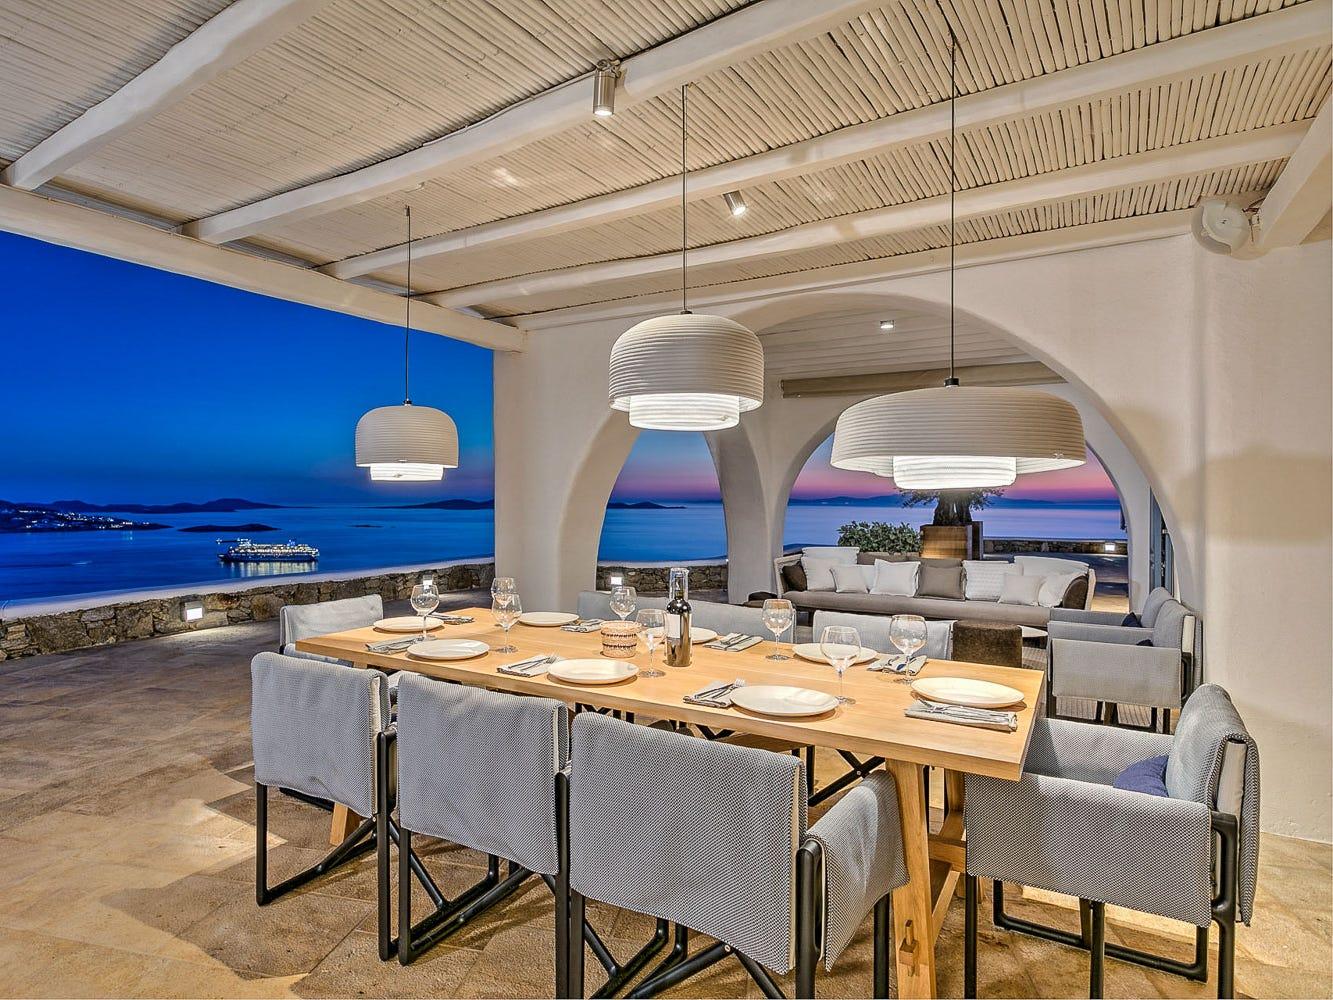 For more information: https://www.luxuryretreats.com/vacation-rentals/greece/mykonos/tourlos/aries-111243